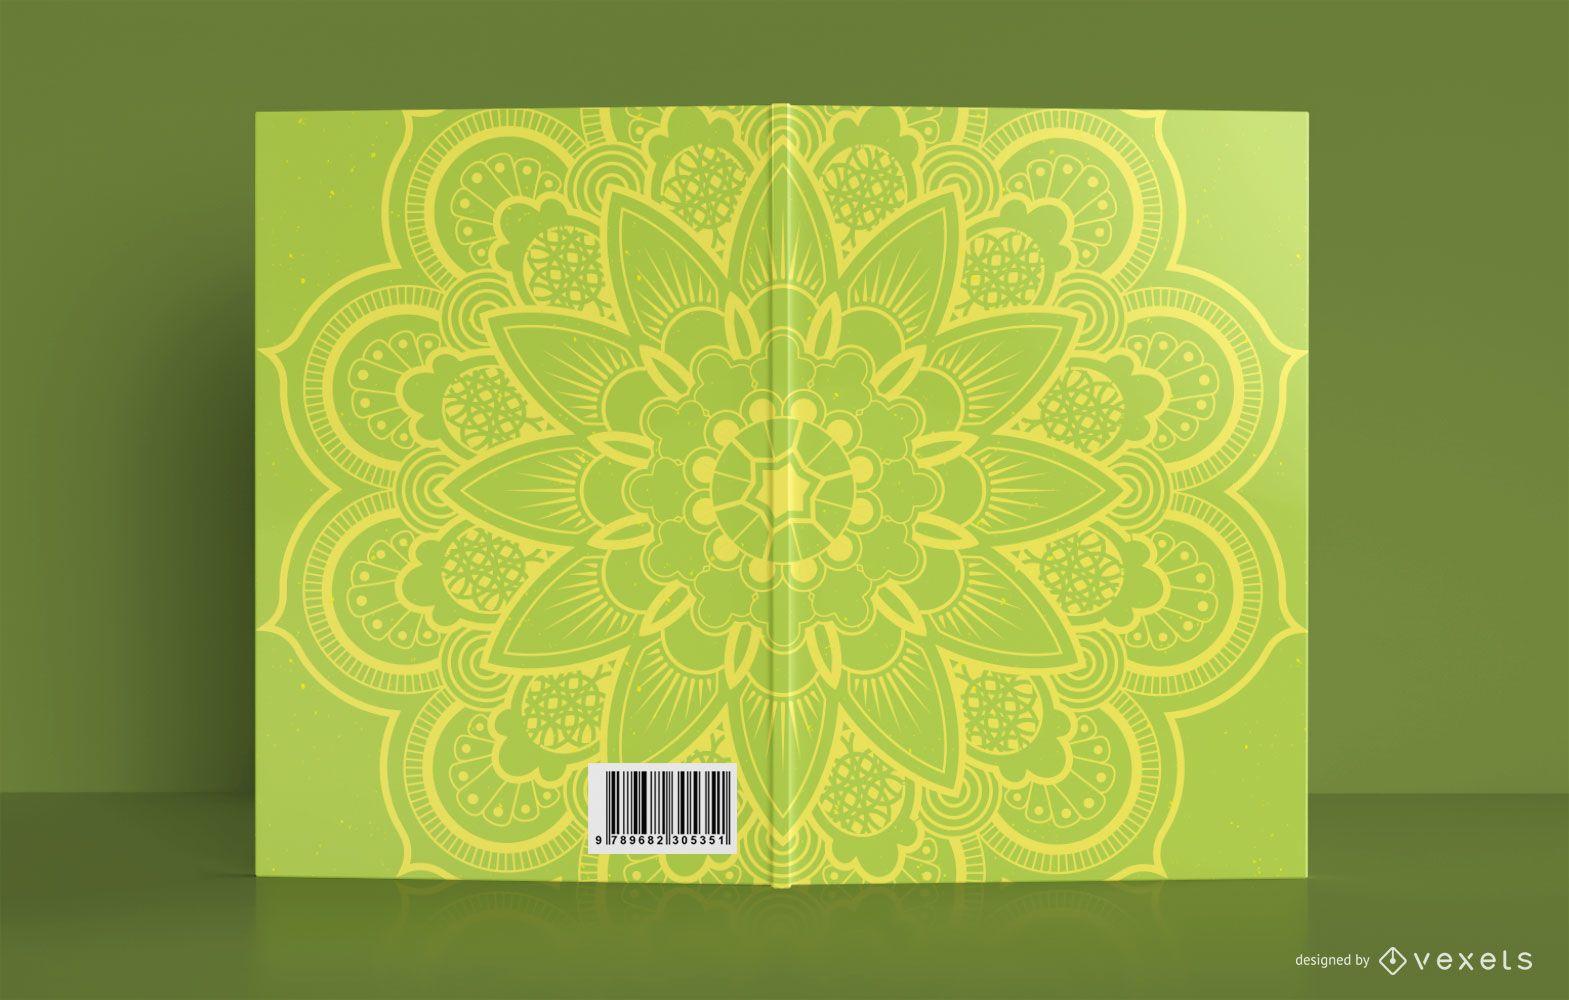 Diseño de portada de libro Mandala amarillo